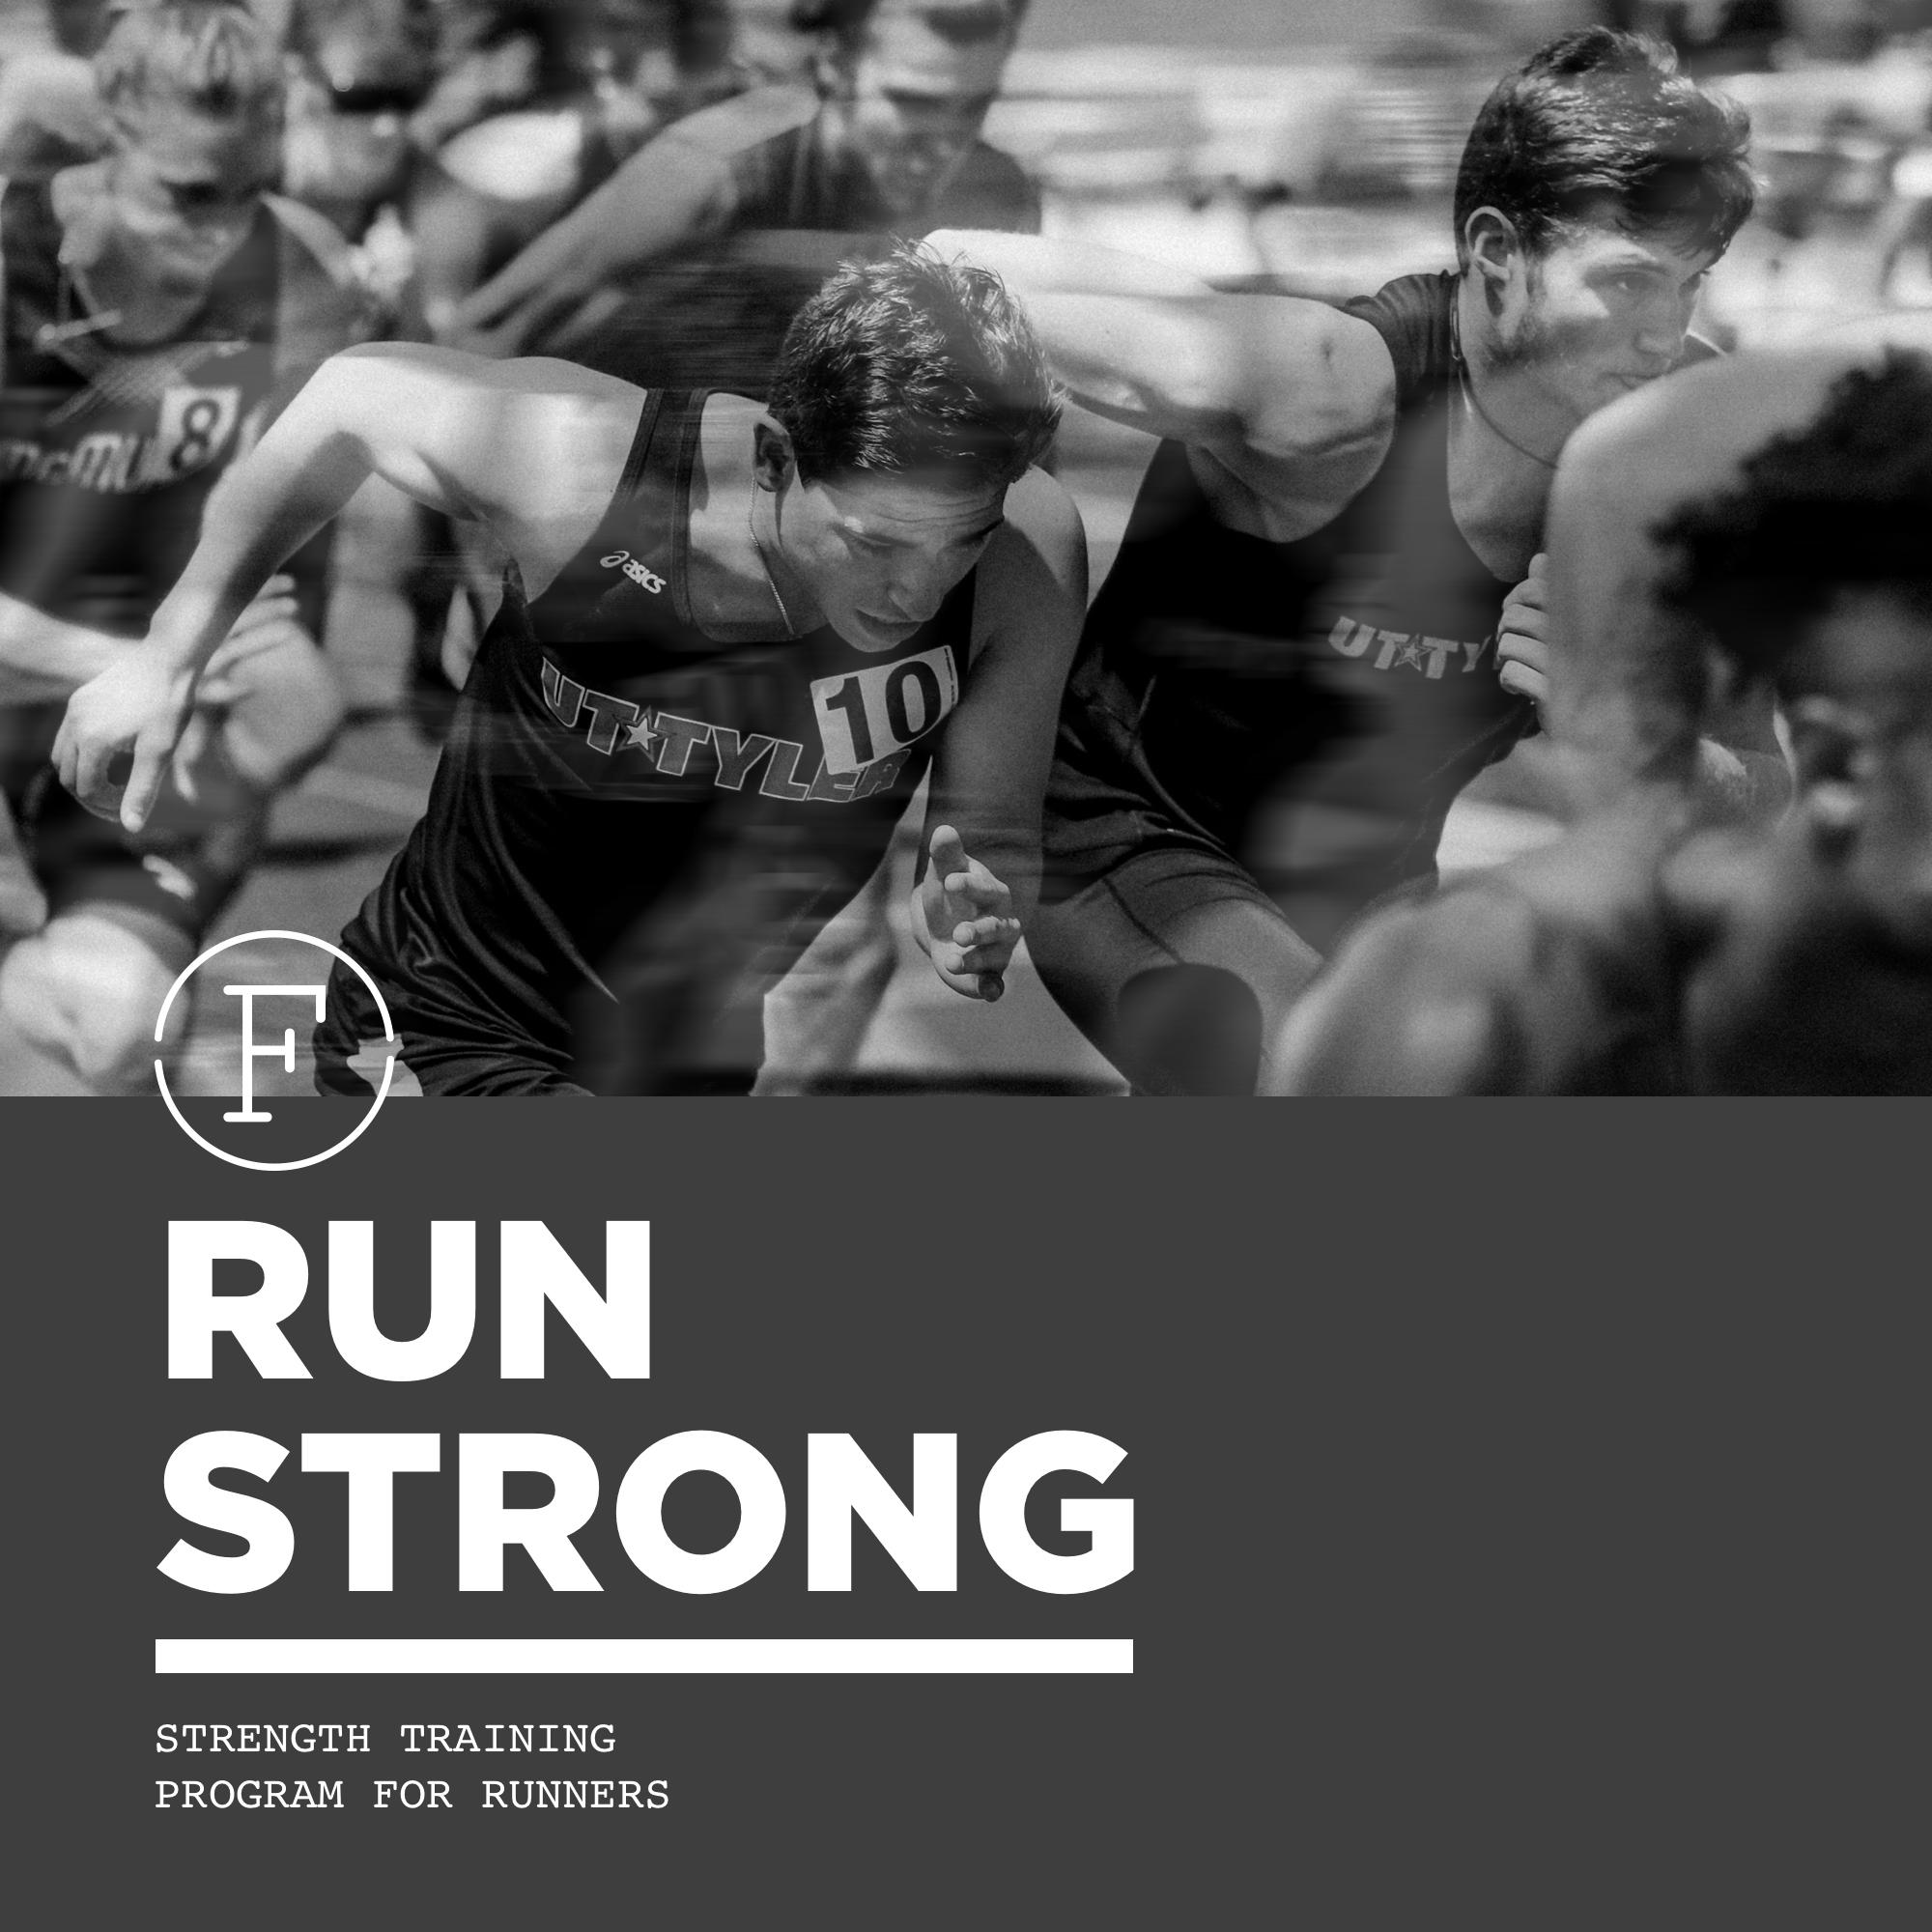 FW_STRONG_Run.jpg